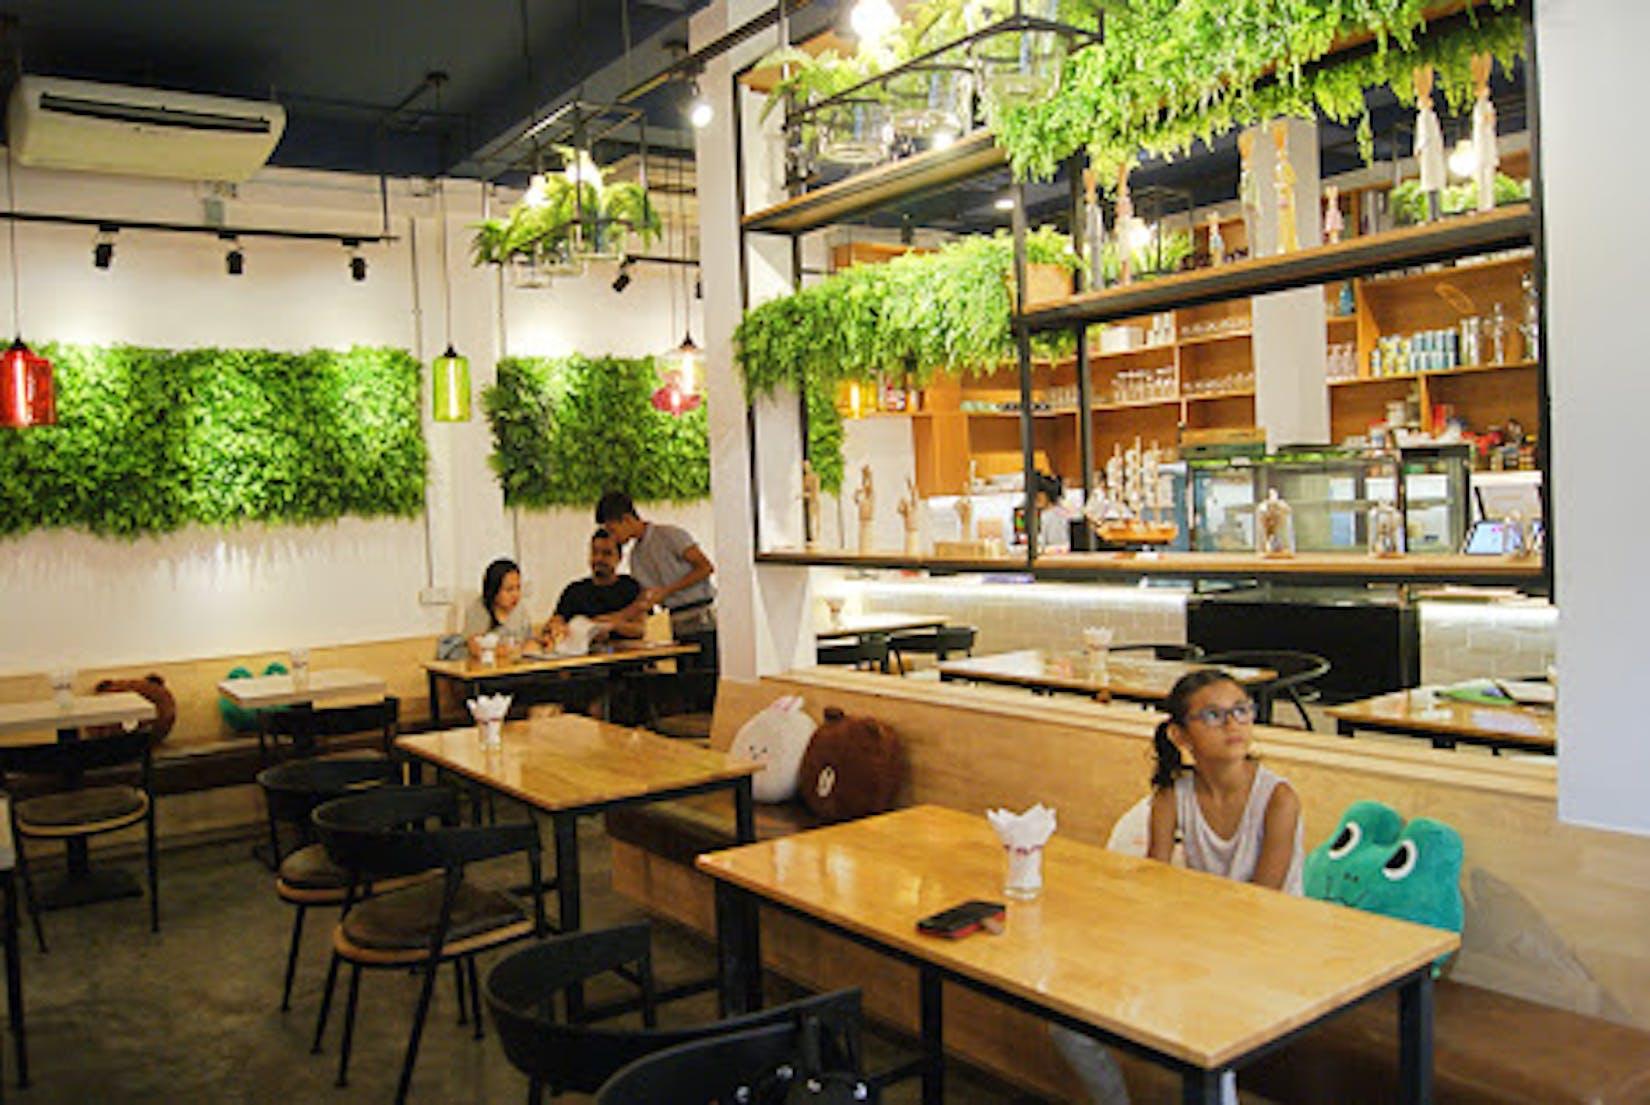 R&D cafe and restaurant | yathar